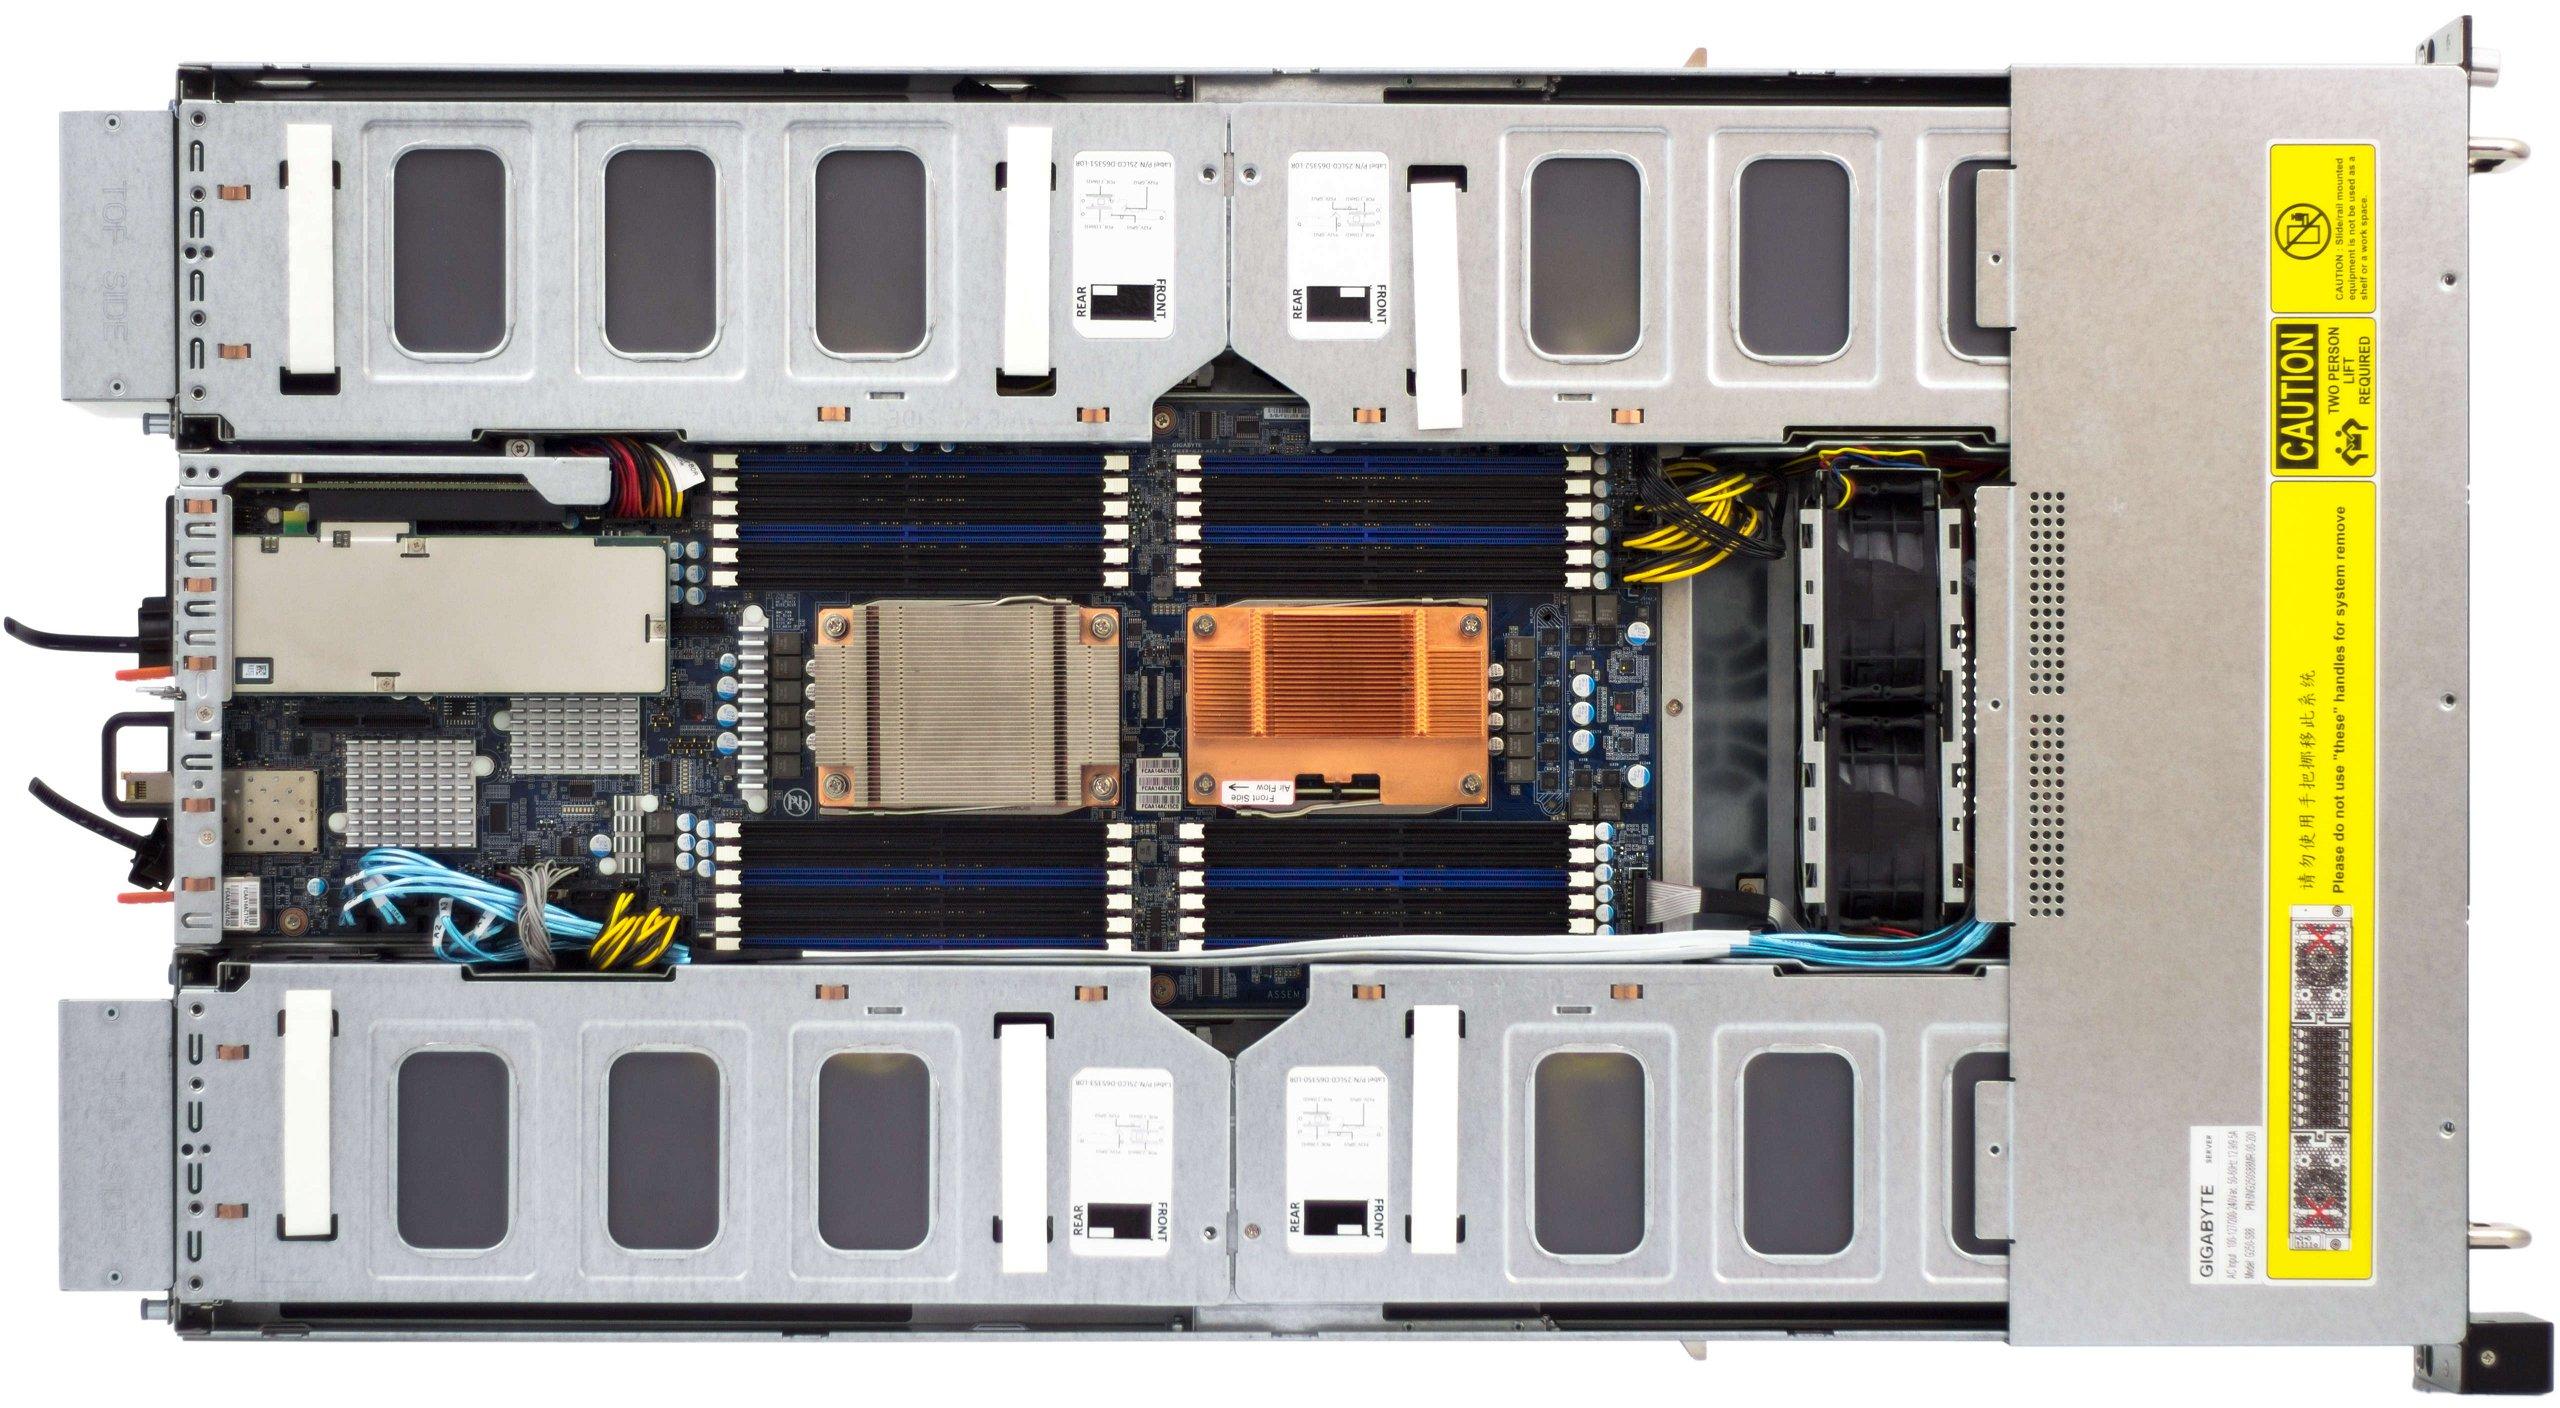 Inside the Ibex Pro (ibep2b)